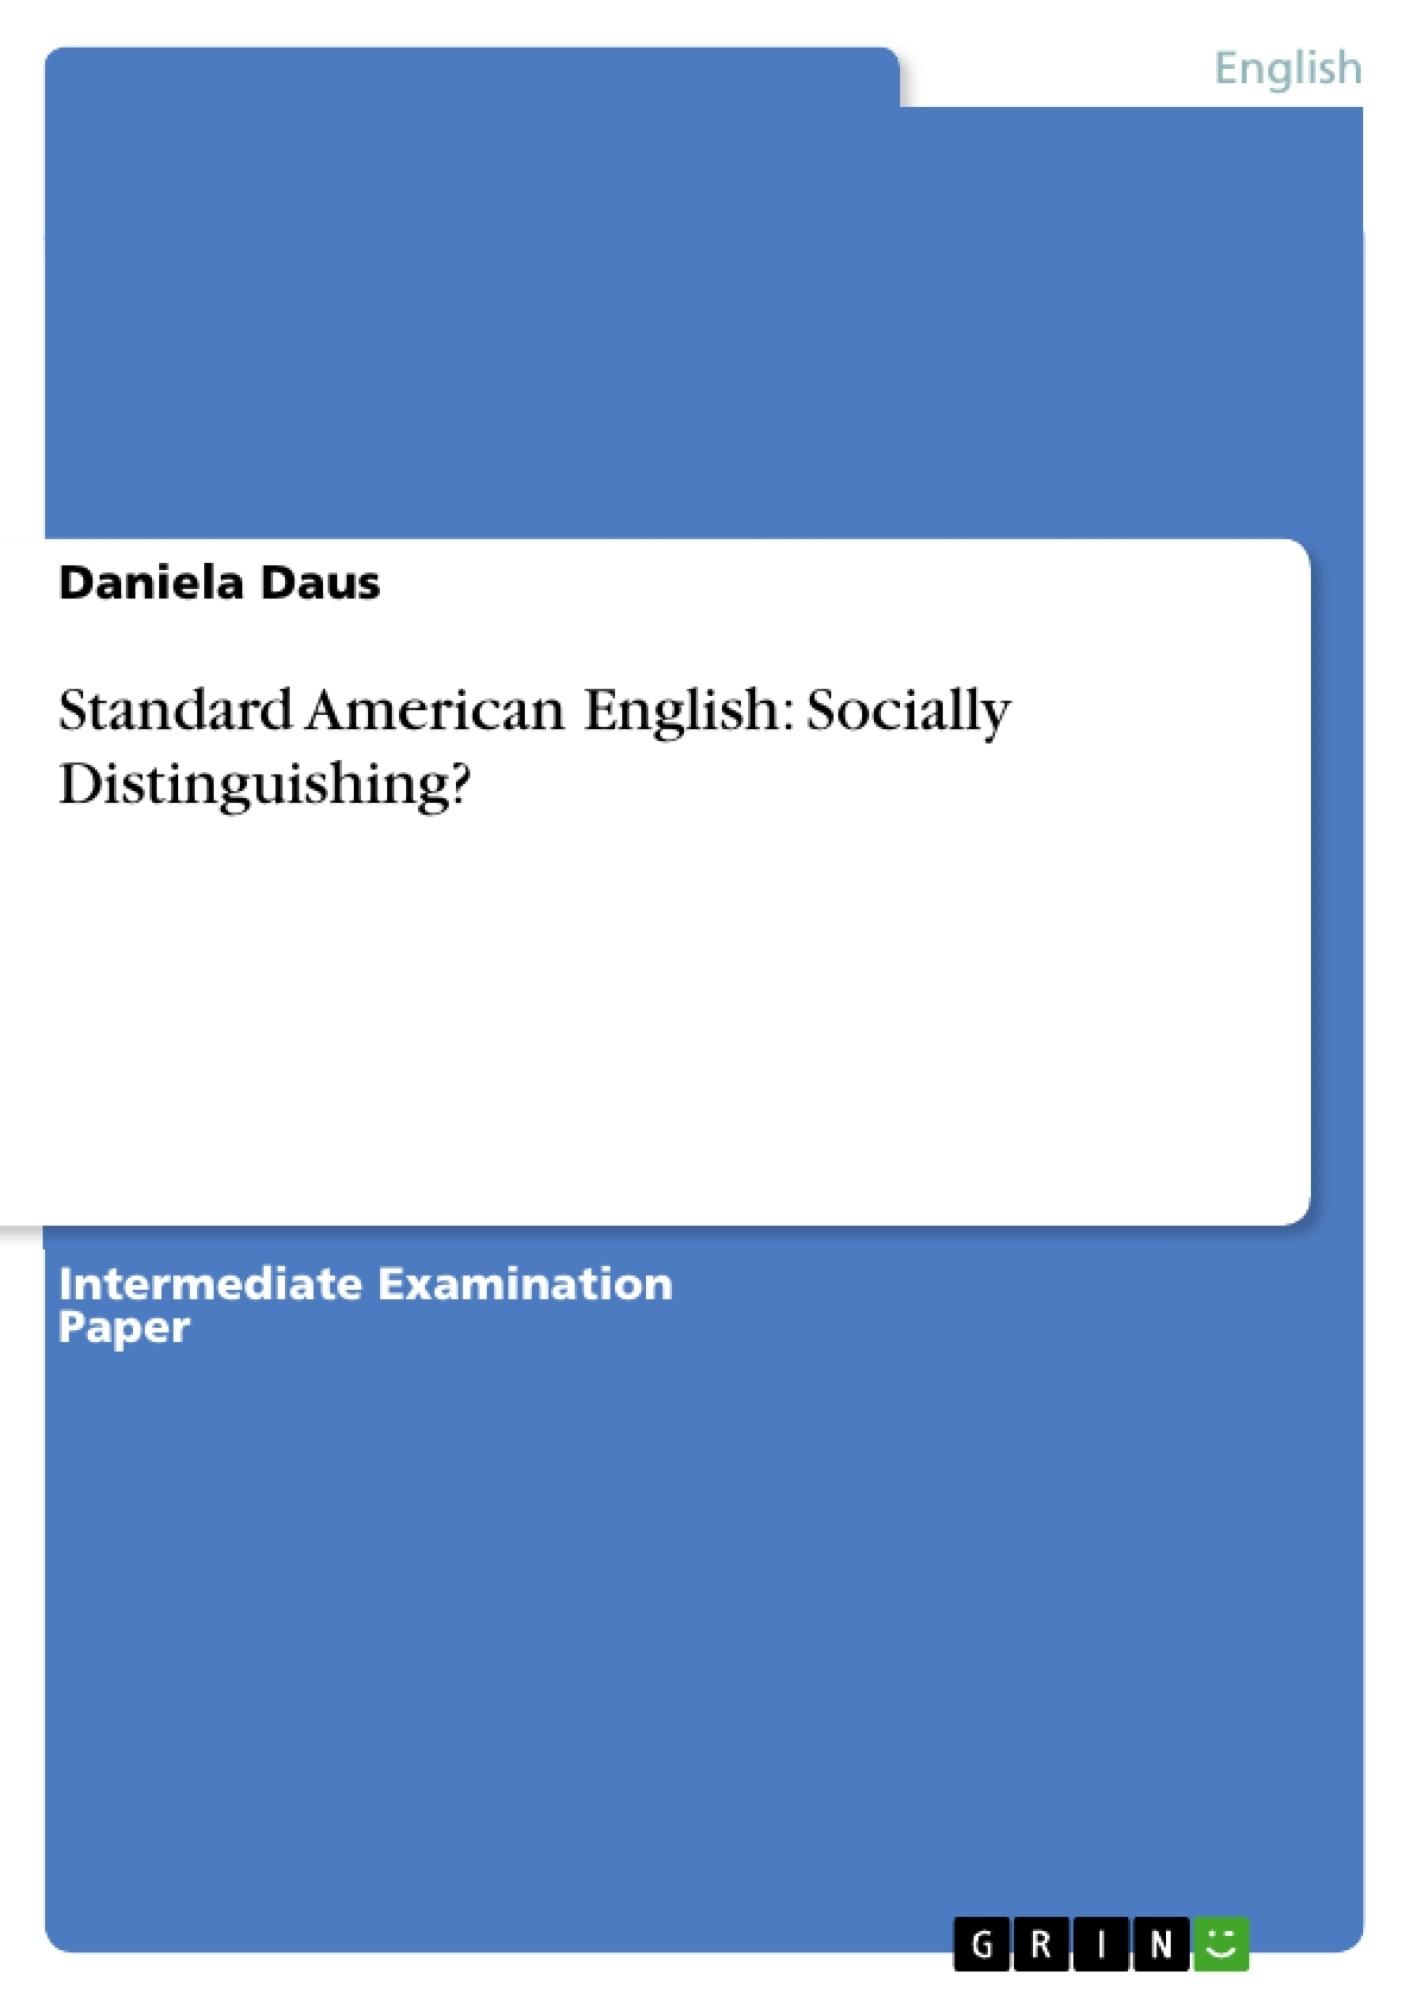 Title: Standard American English: Socially Distinguishing?